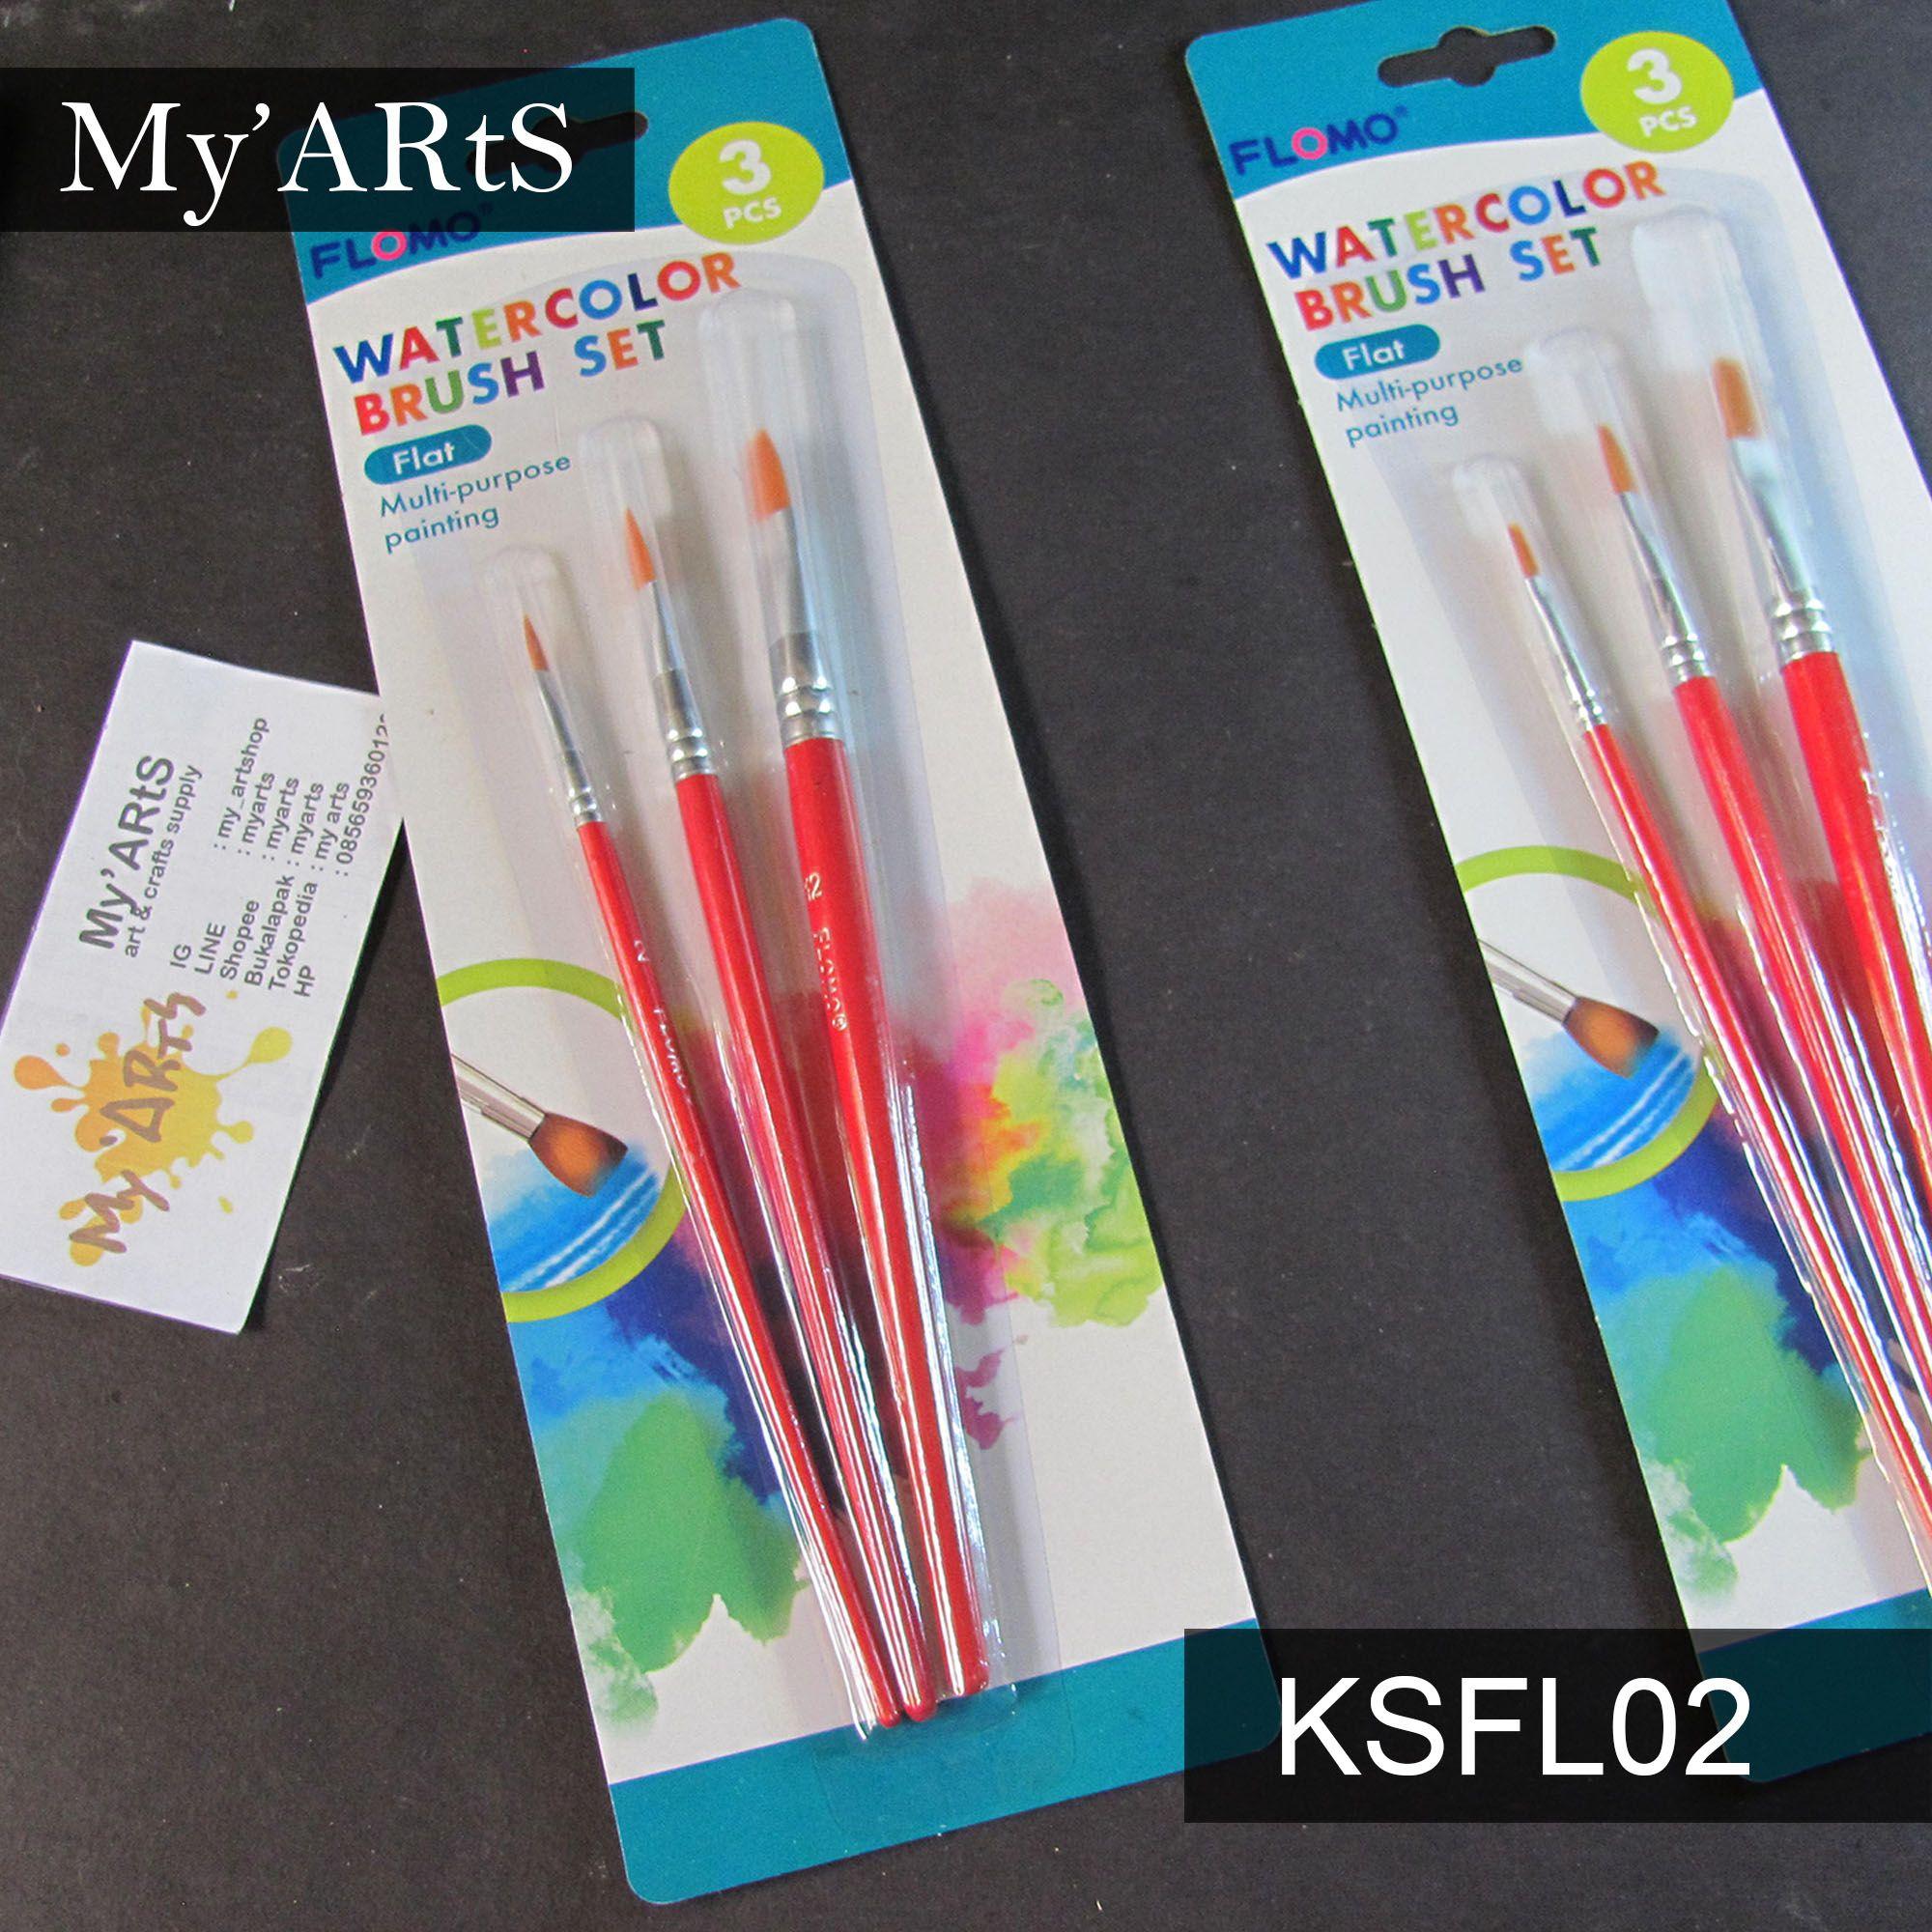 Flomo Watercolor Brush Set Flat Kuas Lukis Set Kuas Cat Air